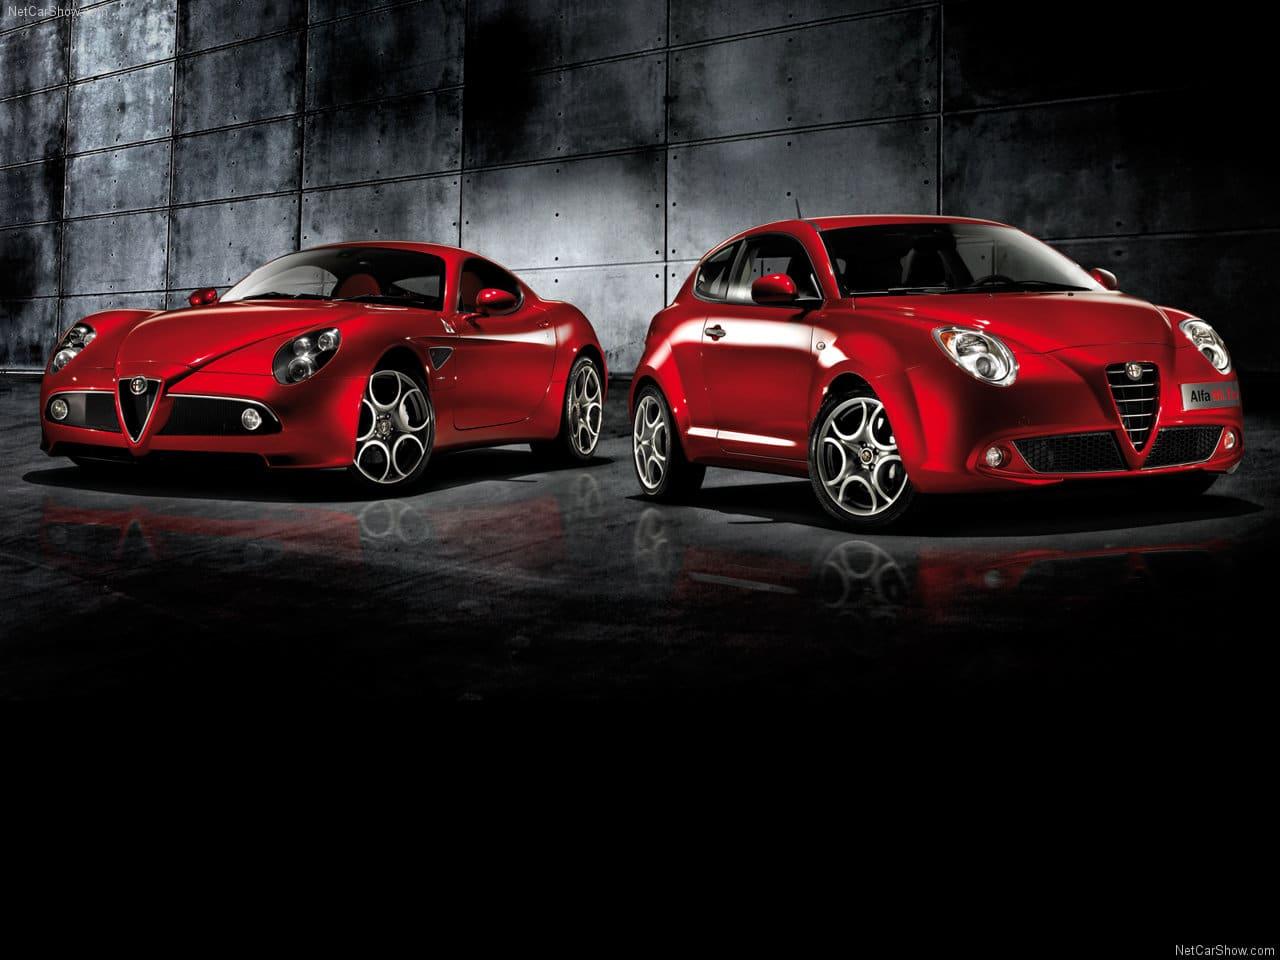 Alfa Romeo Mito, Alfa Romeo, Mito, small car, hatchback, 8C, Alfa Romeo 8C, car, cars, city car, Fiat 500, motoring, automotive, bargain car, cheap car, eBay, eBay motors, autotrader